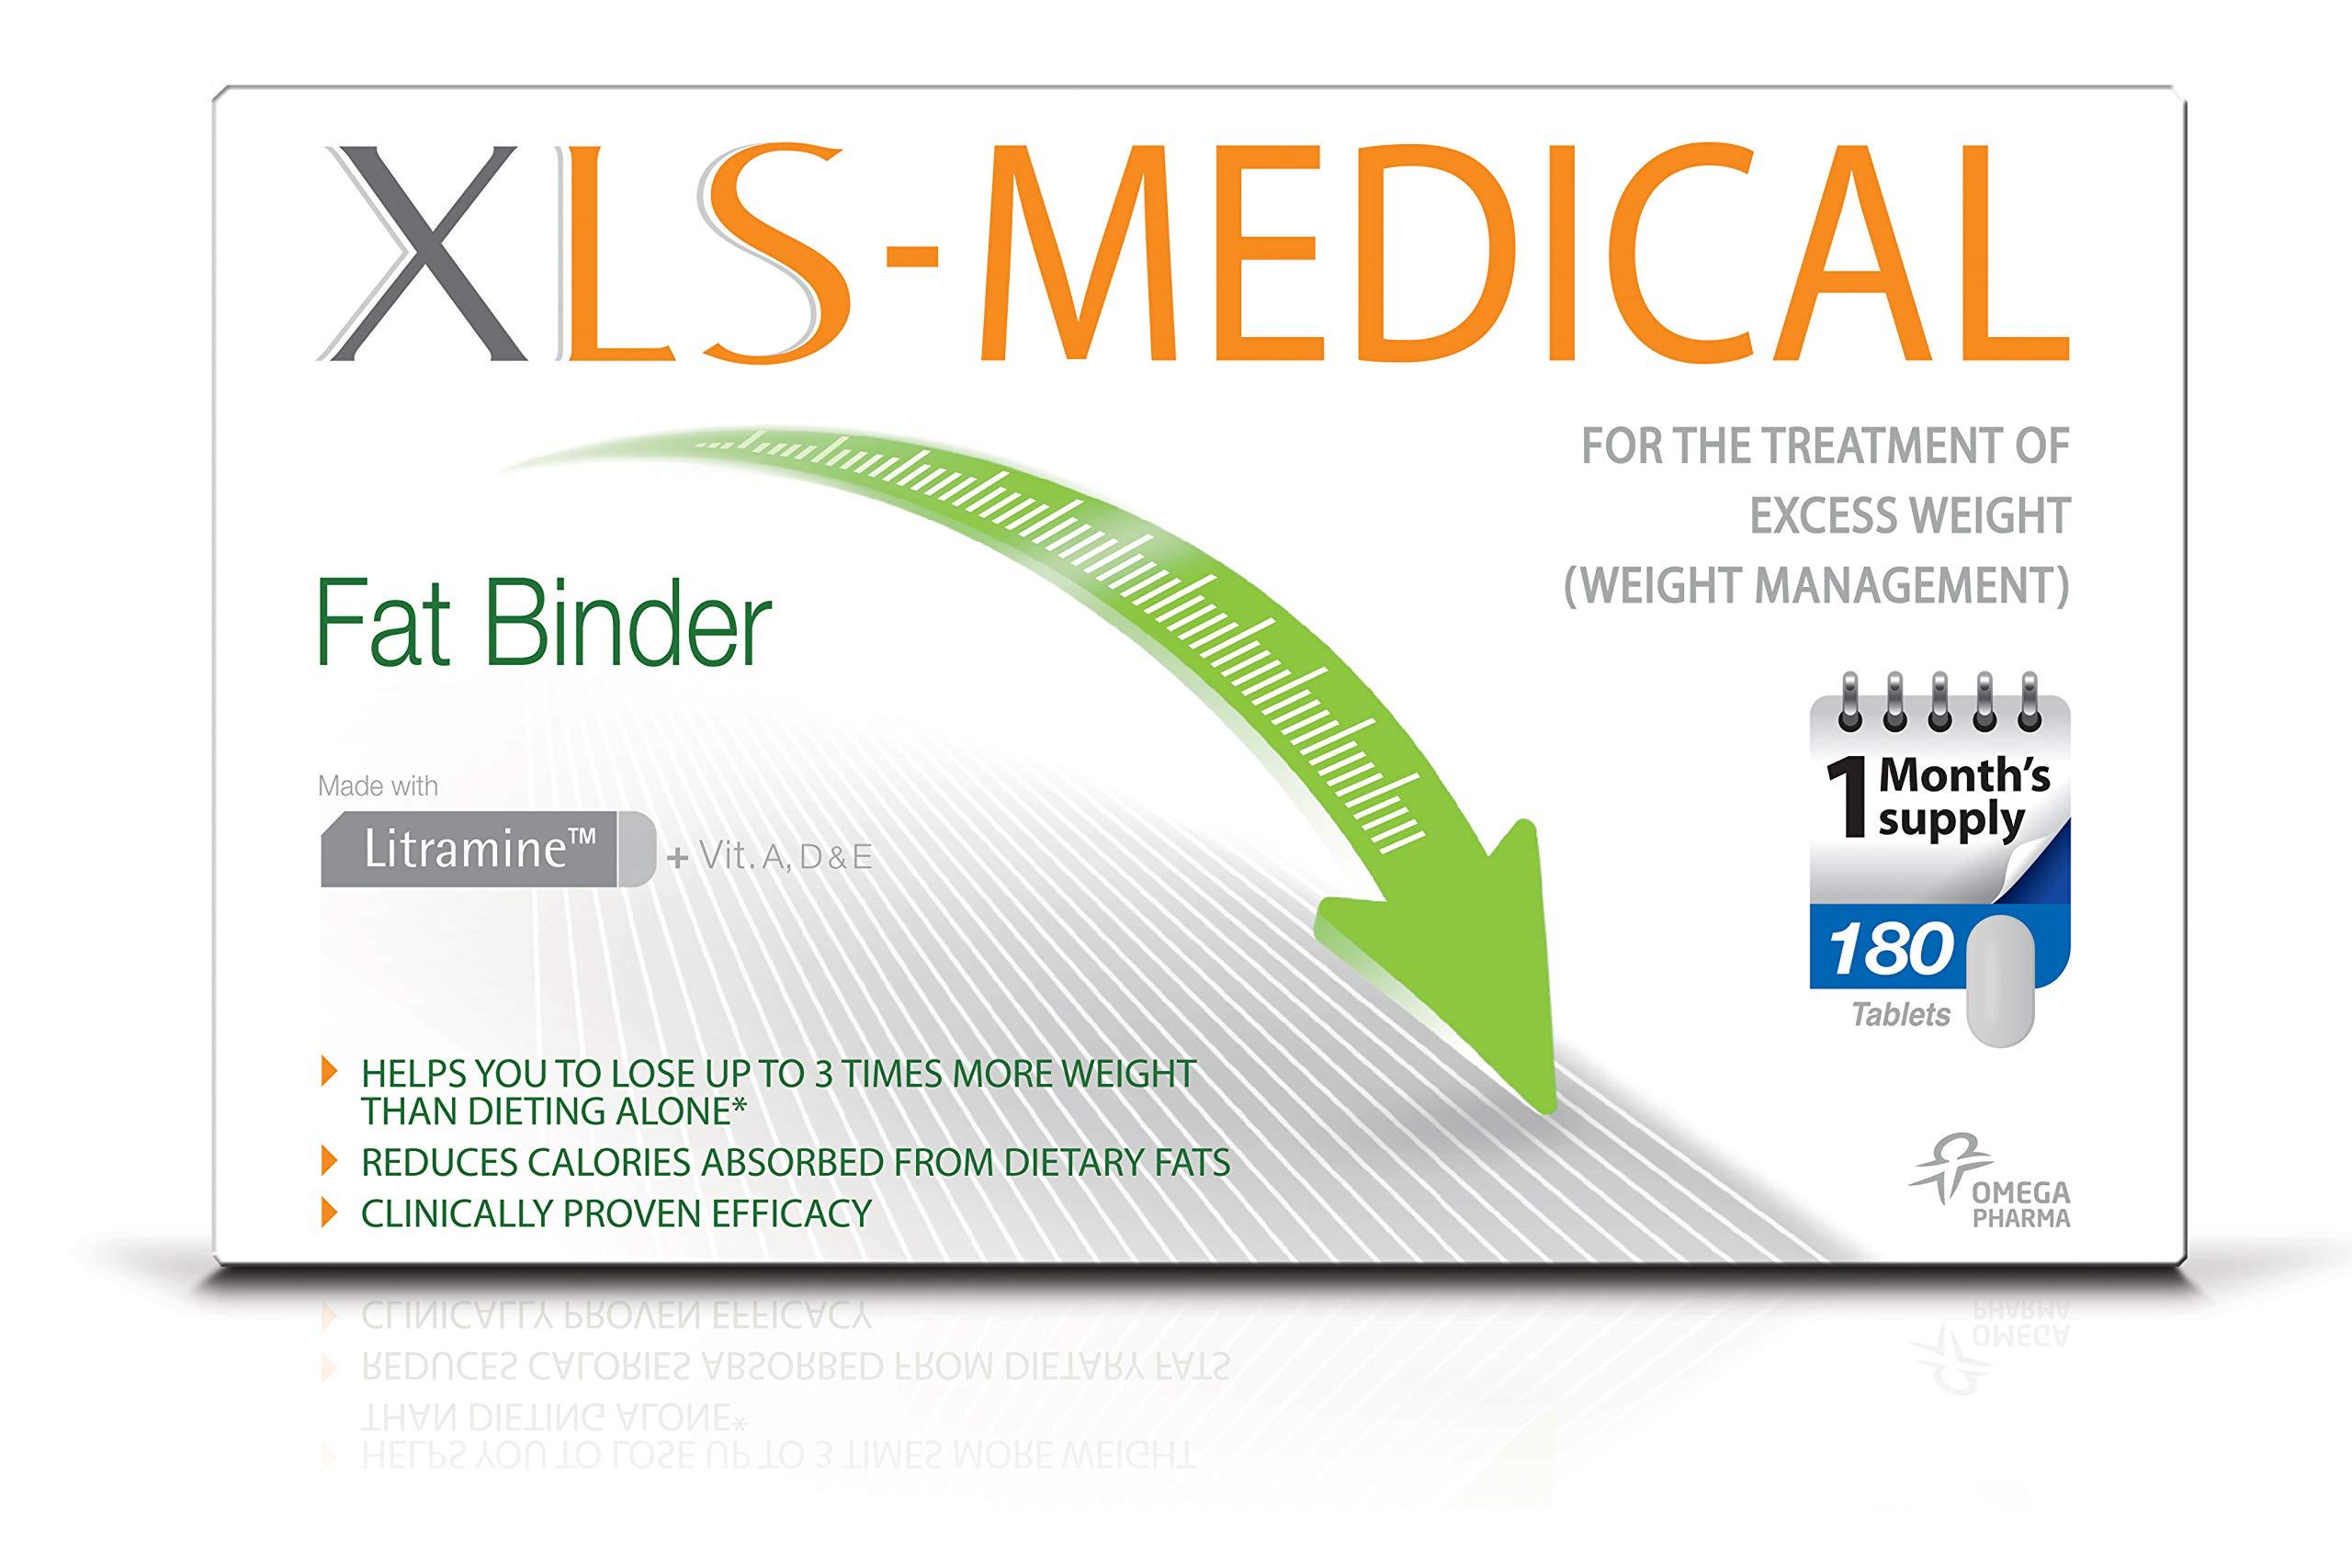 81lvHNApfeL - XLS Medical Fat Binder Tablets Weight Loss Aid, 180 Tablets